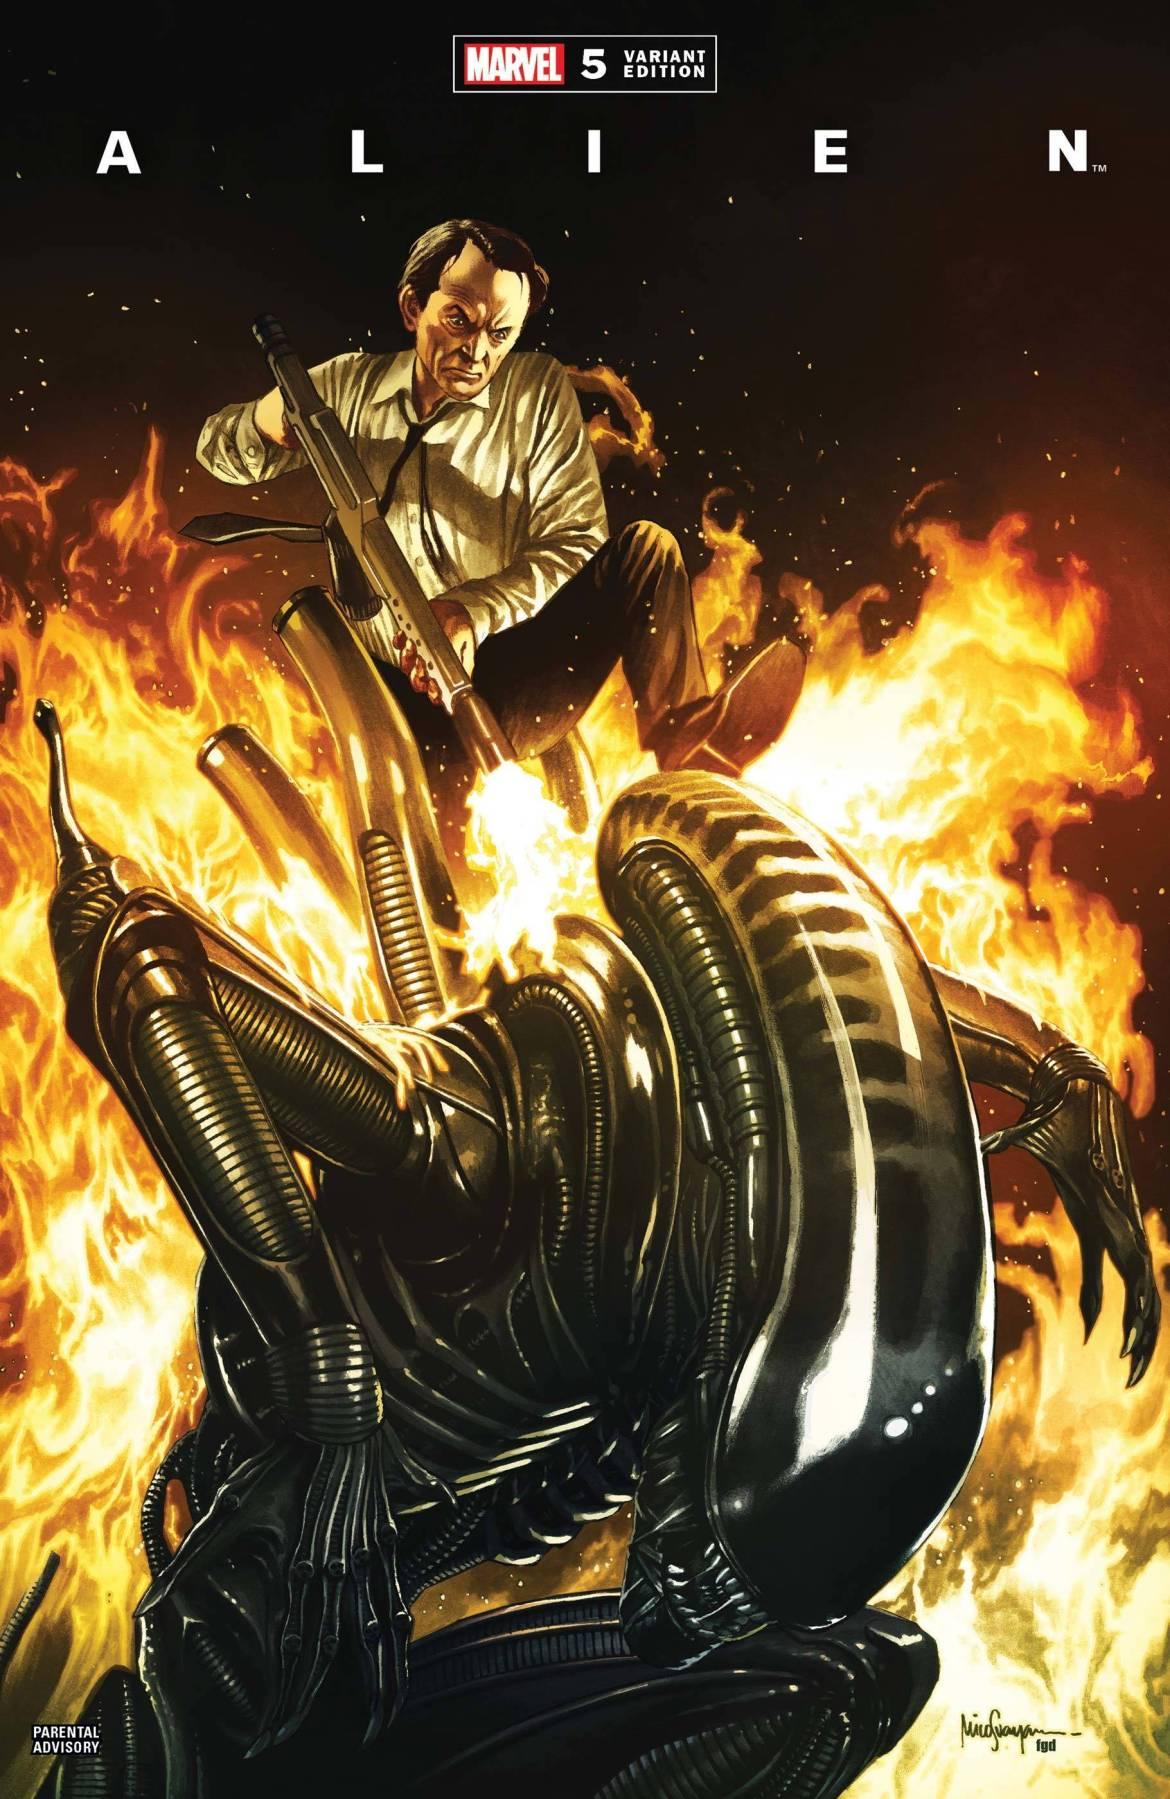 STL192071 ComicList: Marvel Comics New Releases for 07/21/2021